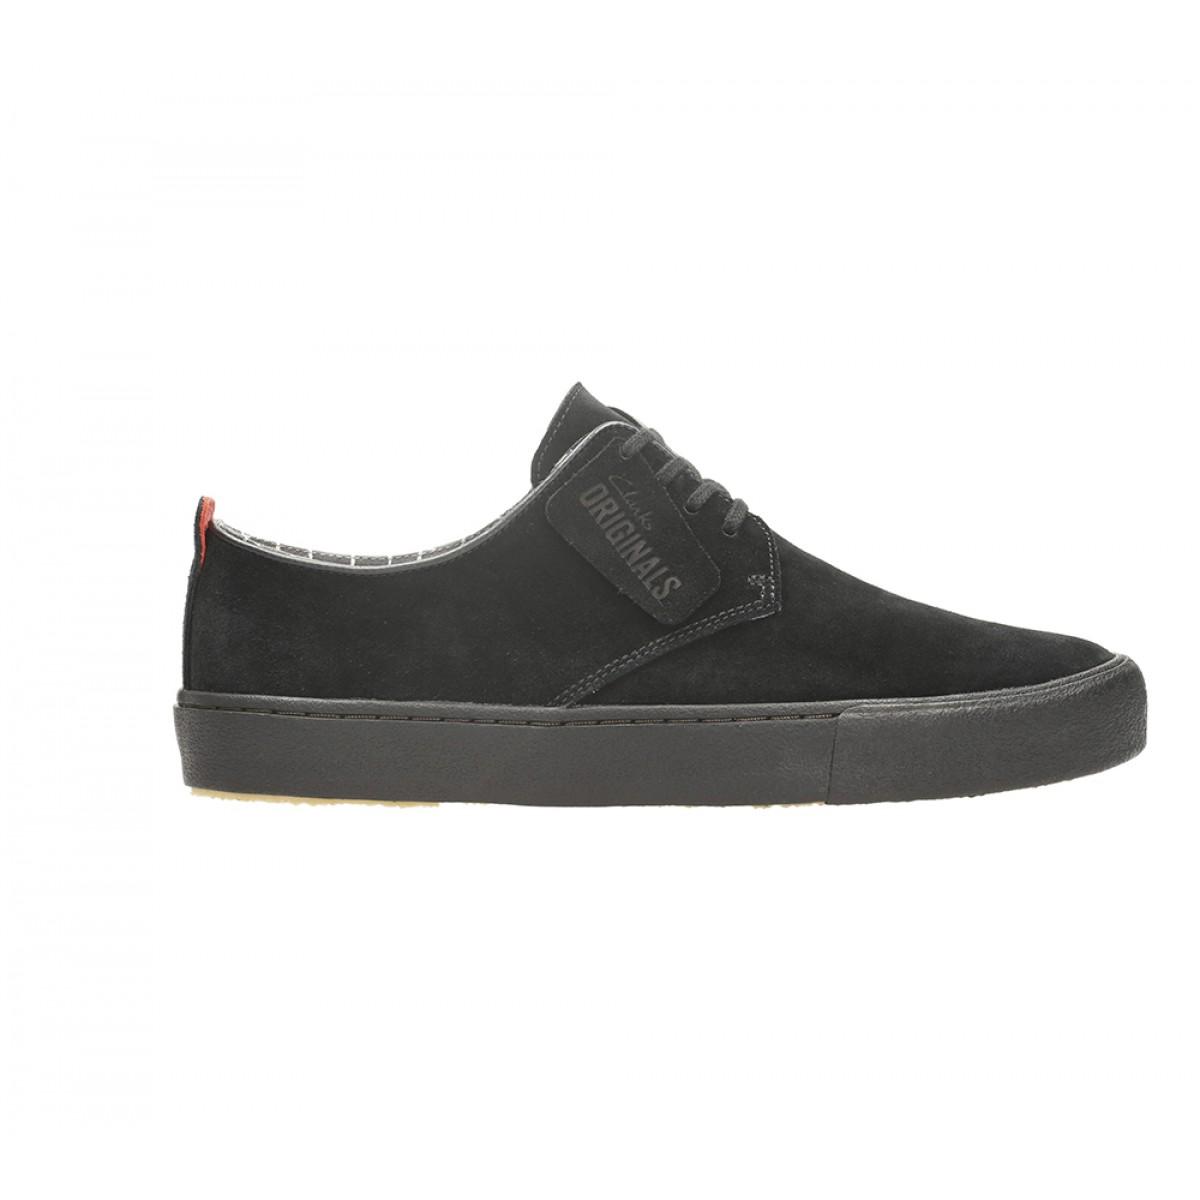 Clarks Mens Leisure Shoe Black